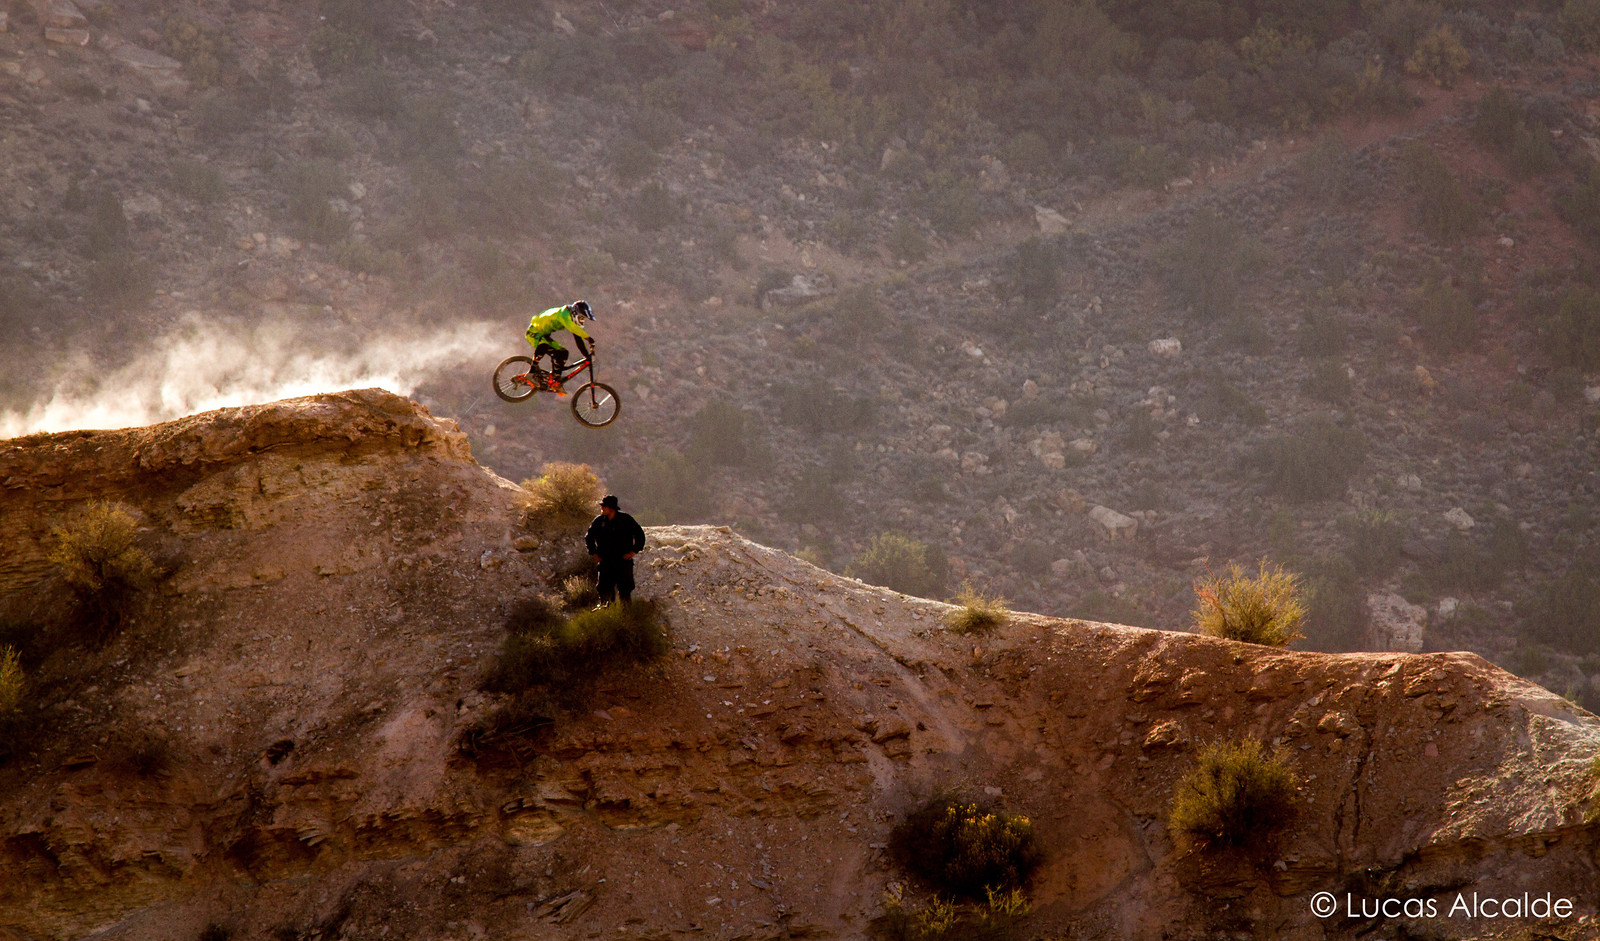 True Freedom w/ Kenny Smith - Lucas_Alcalde - Mountain Biking Pictures - Vital MTB